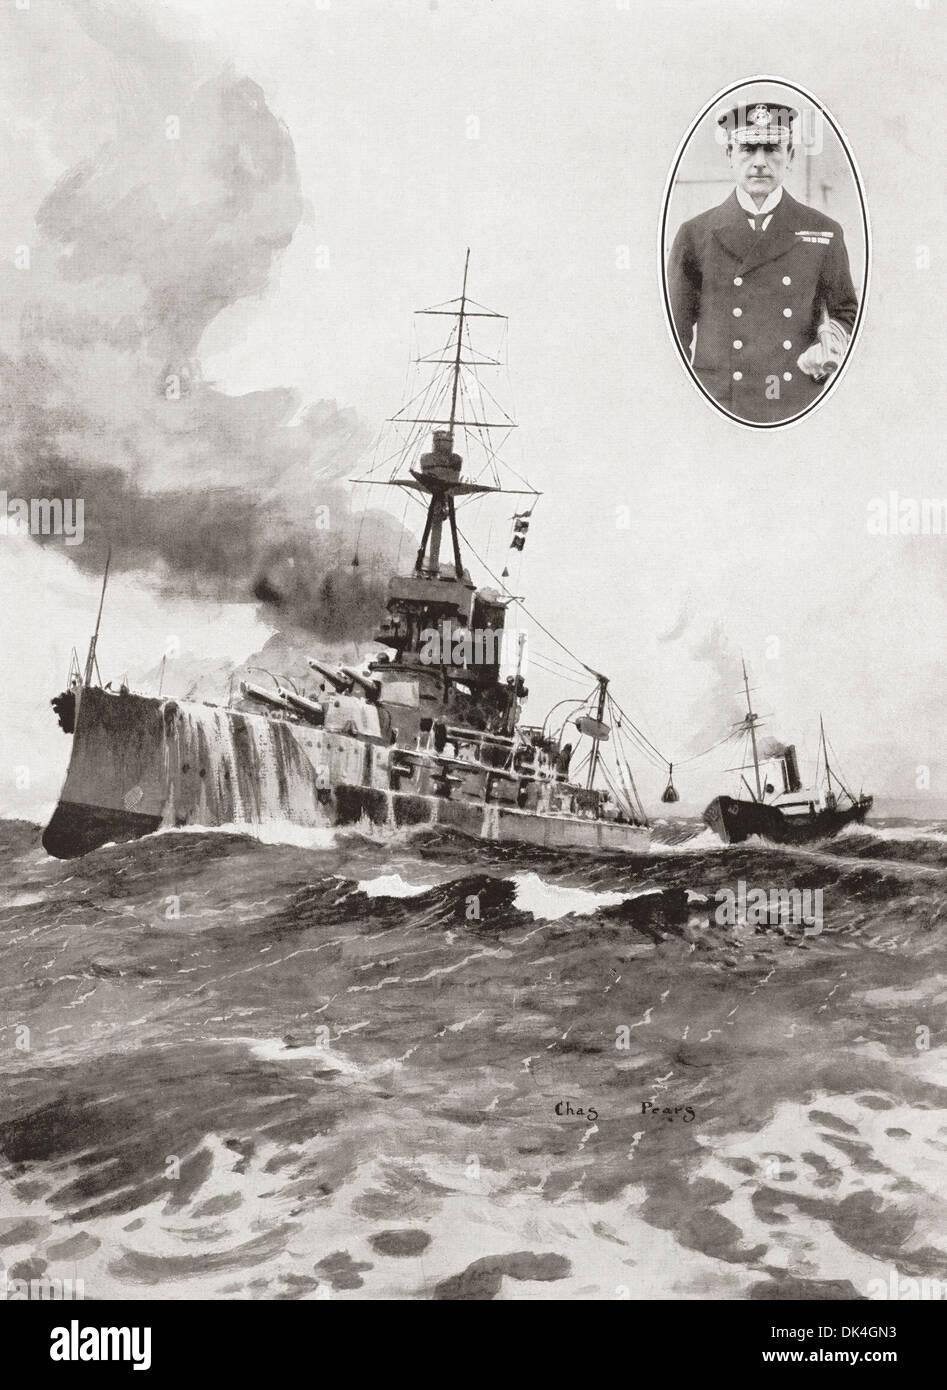 Admiral Sir John Jellicoe's flagship, Iron Duke, being coaled at sea - Stock Image